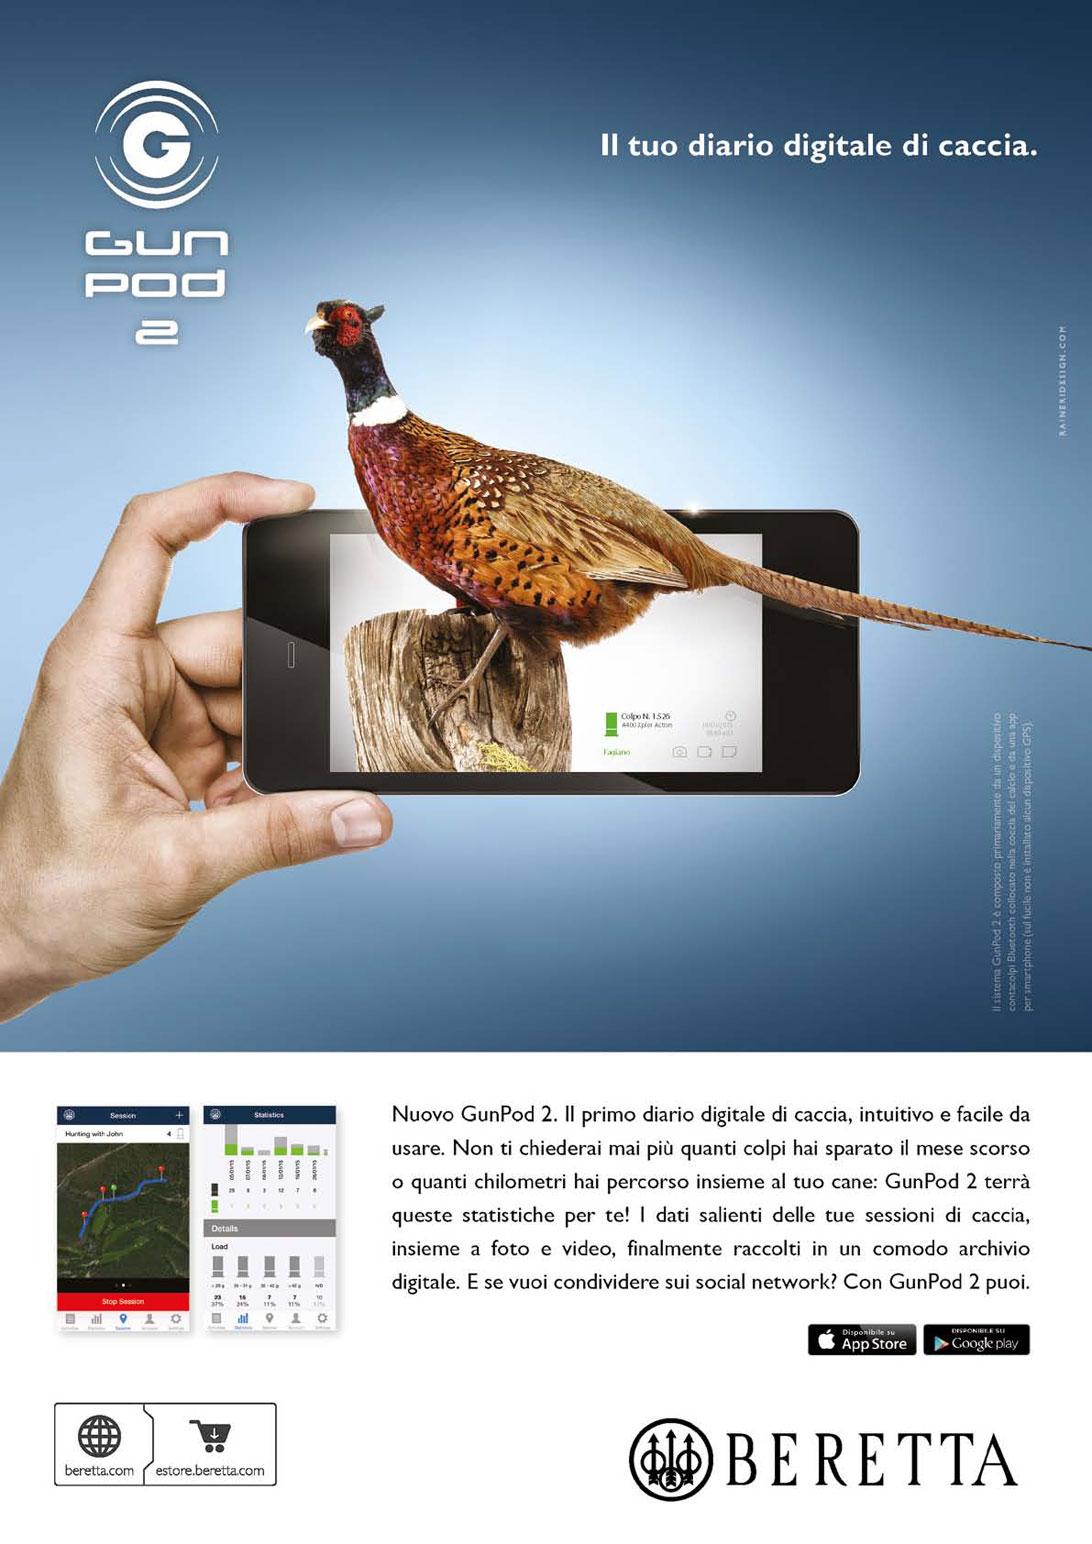 Beretta Gun Pod 2 App Mobile smartphone